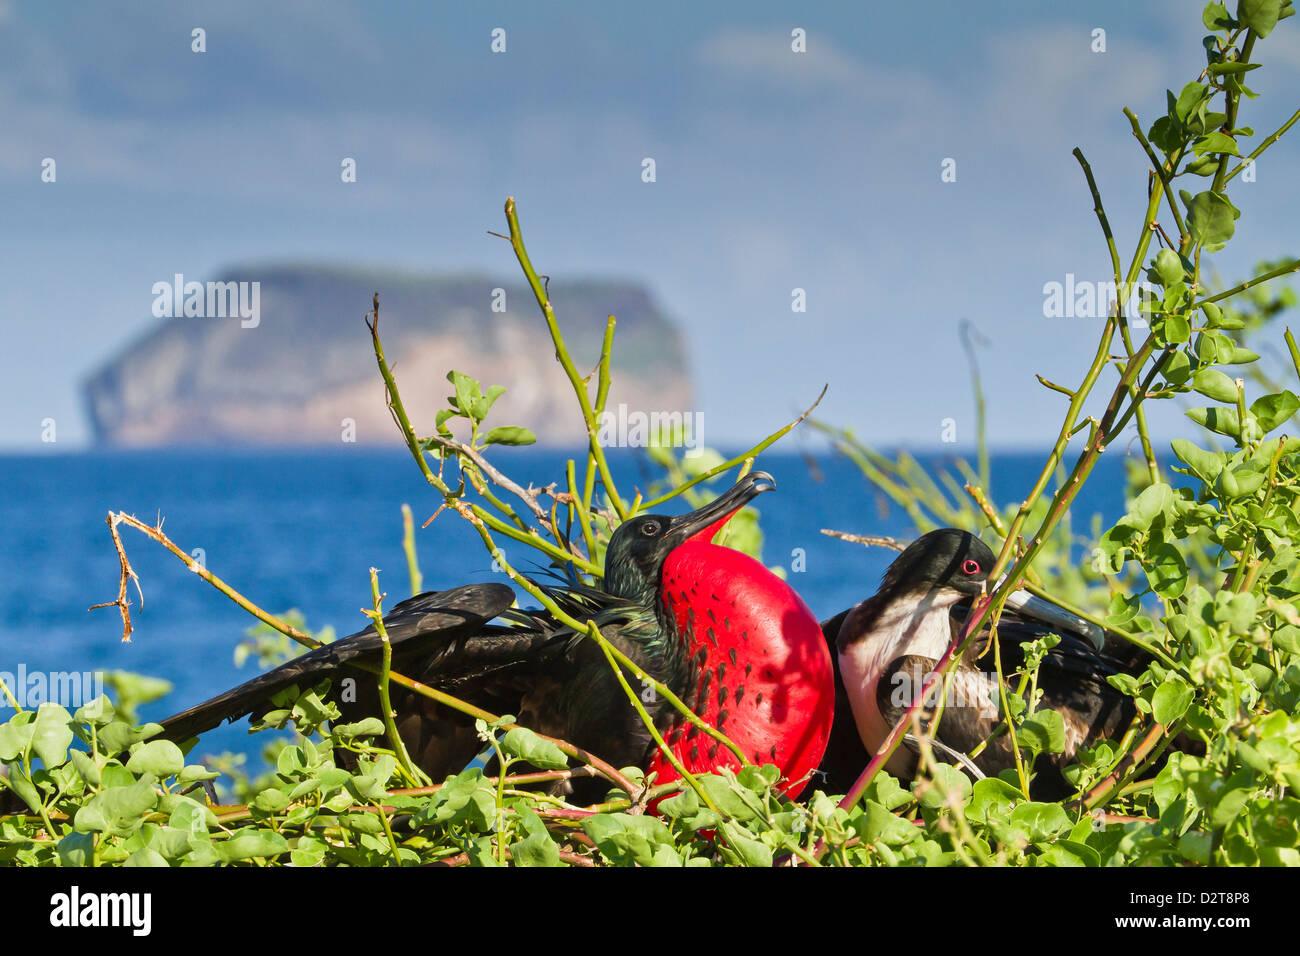 Adult male magnificent frigatebird (Fregata magnificens), North Seymour Island, Galapagos Islands, Ecuador - Stock Image